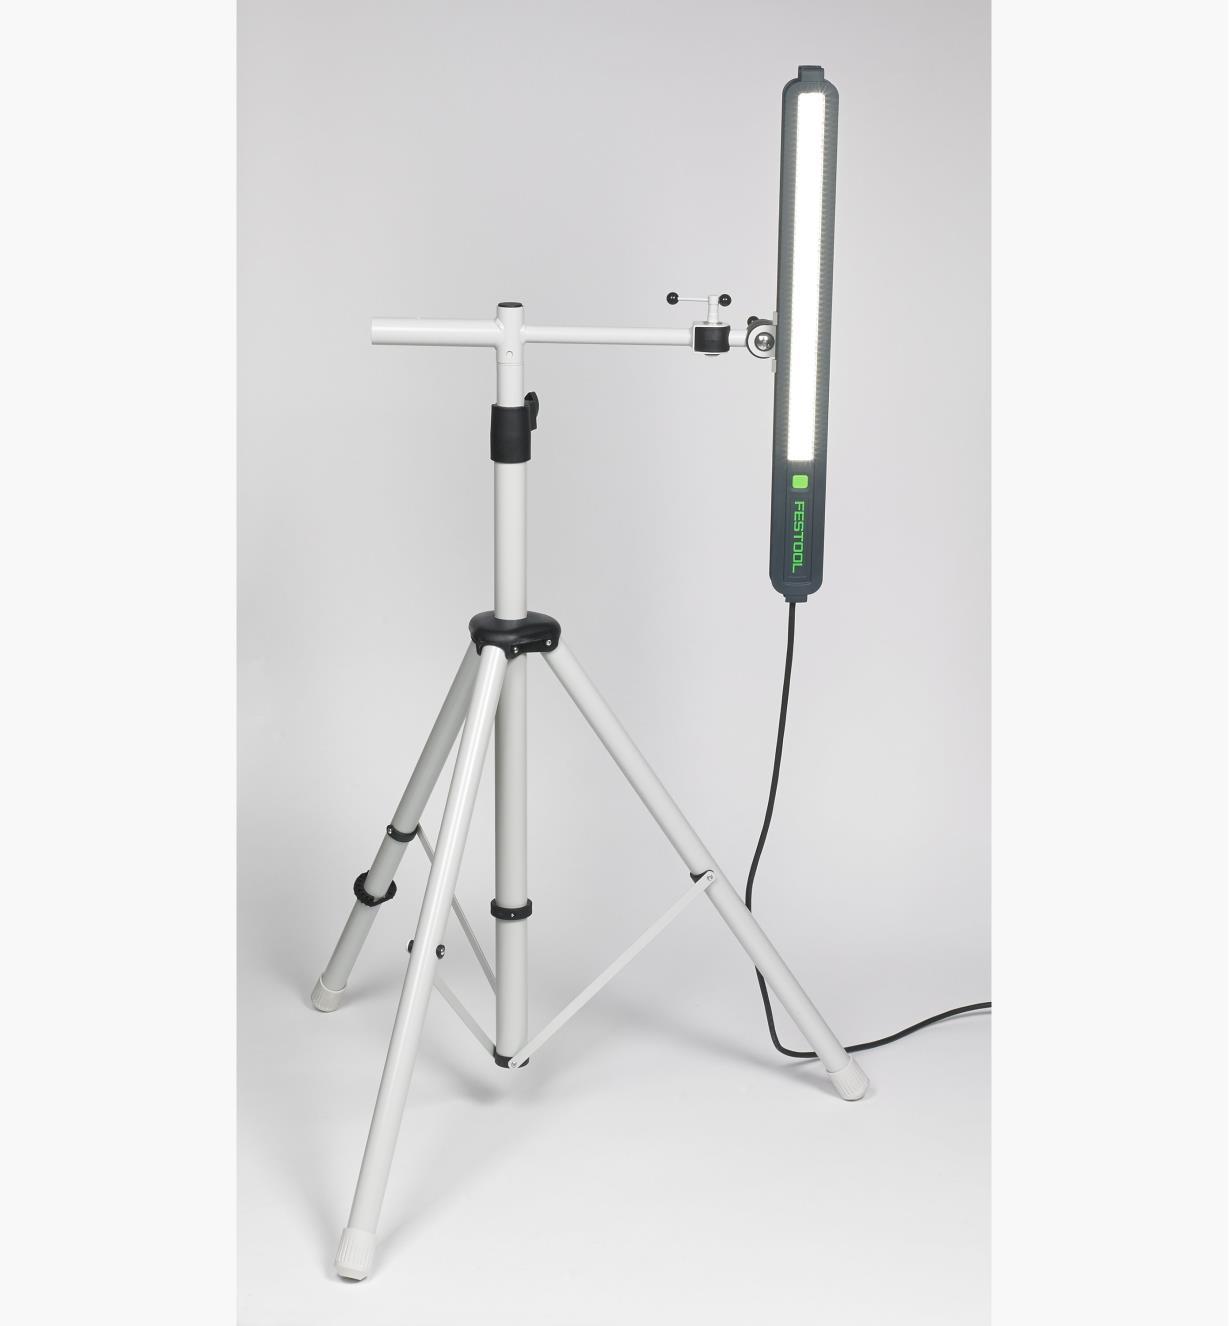 STL 450 Inspection Light Set